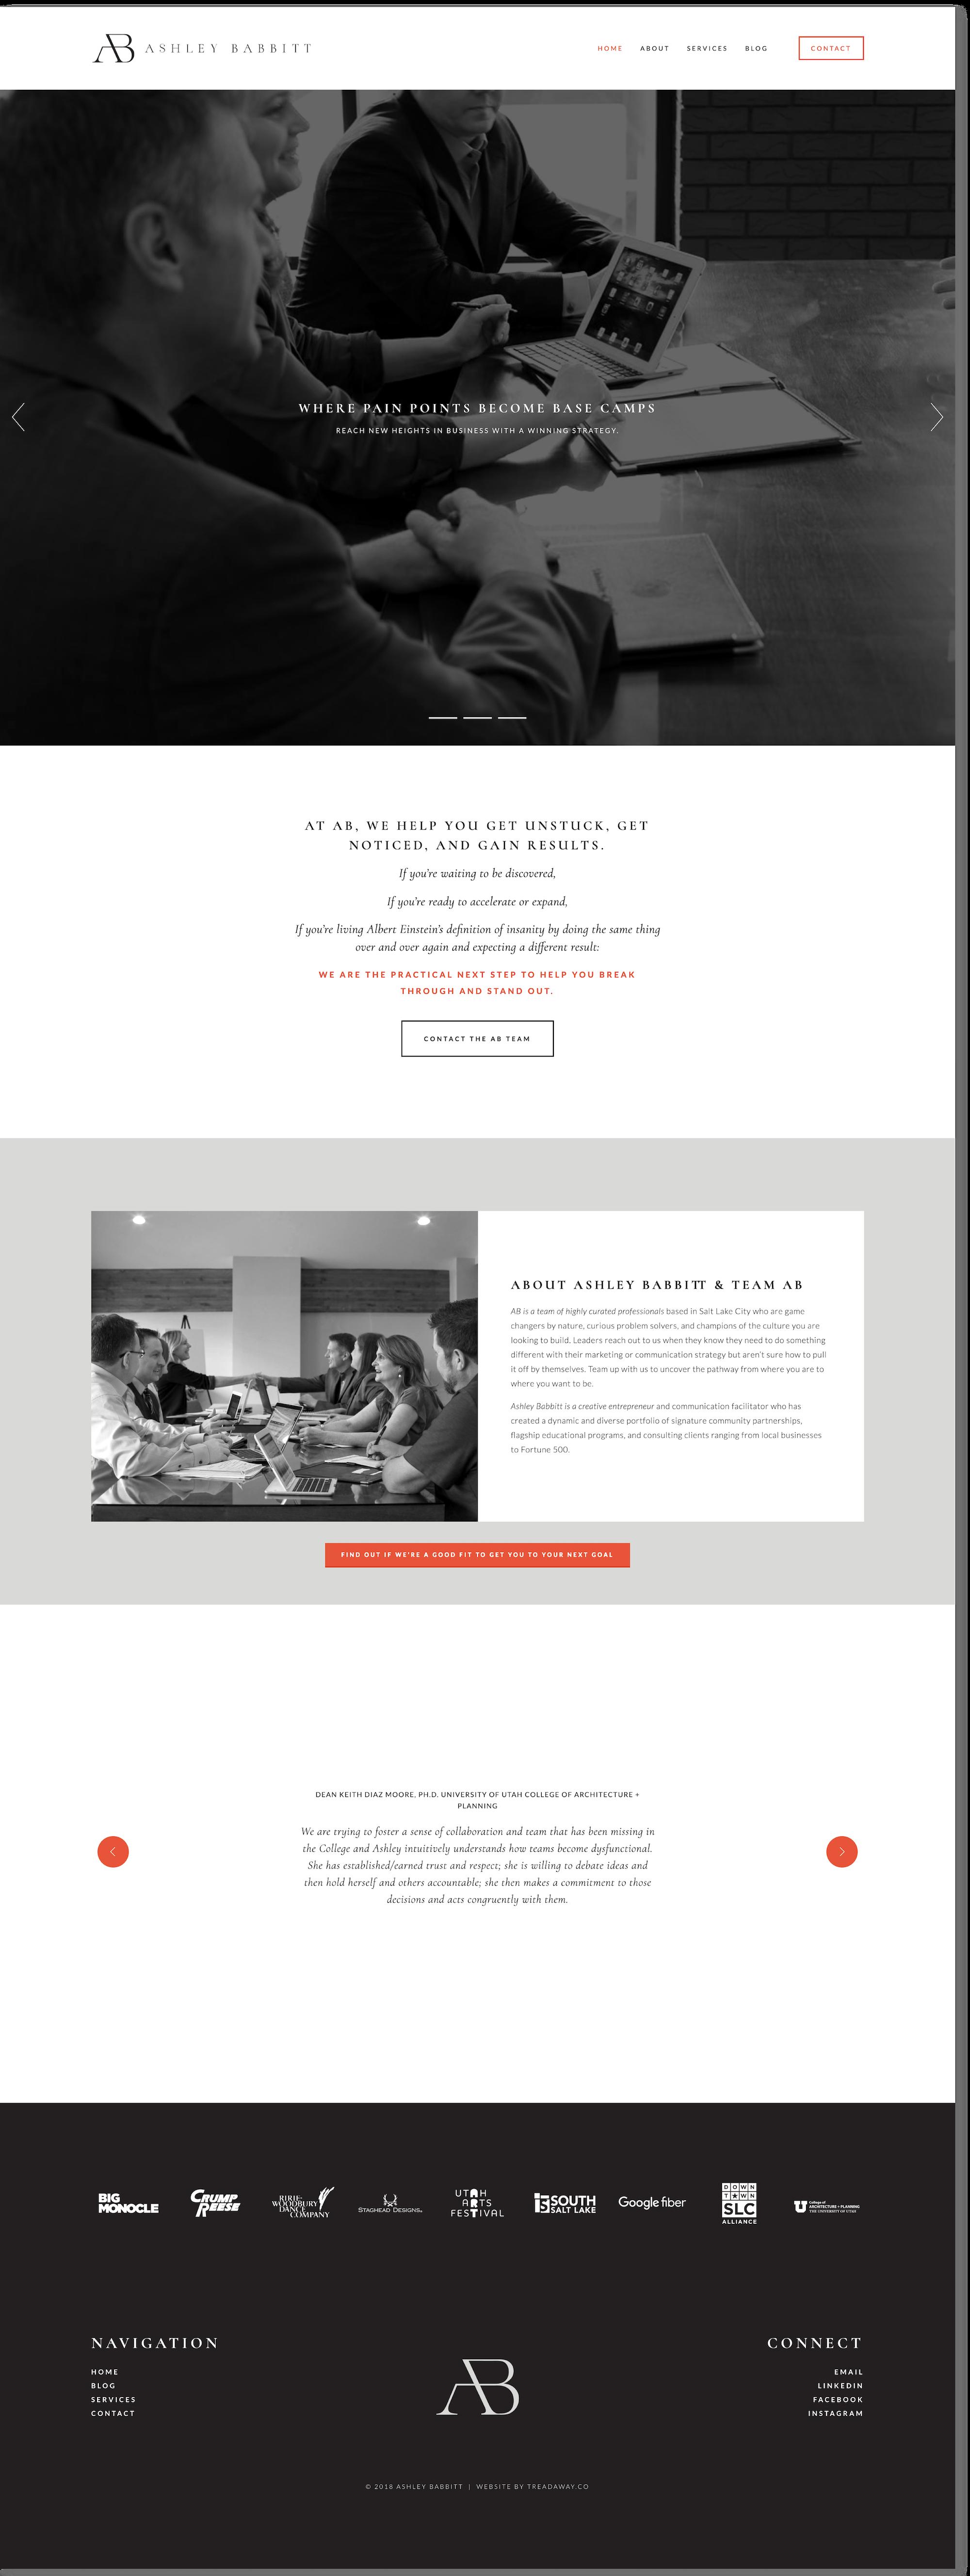 Ashley Babbitt Website Design Squarespace Circle Treadaway Co Design Branding-02.png